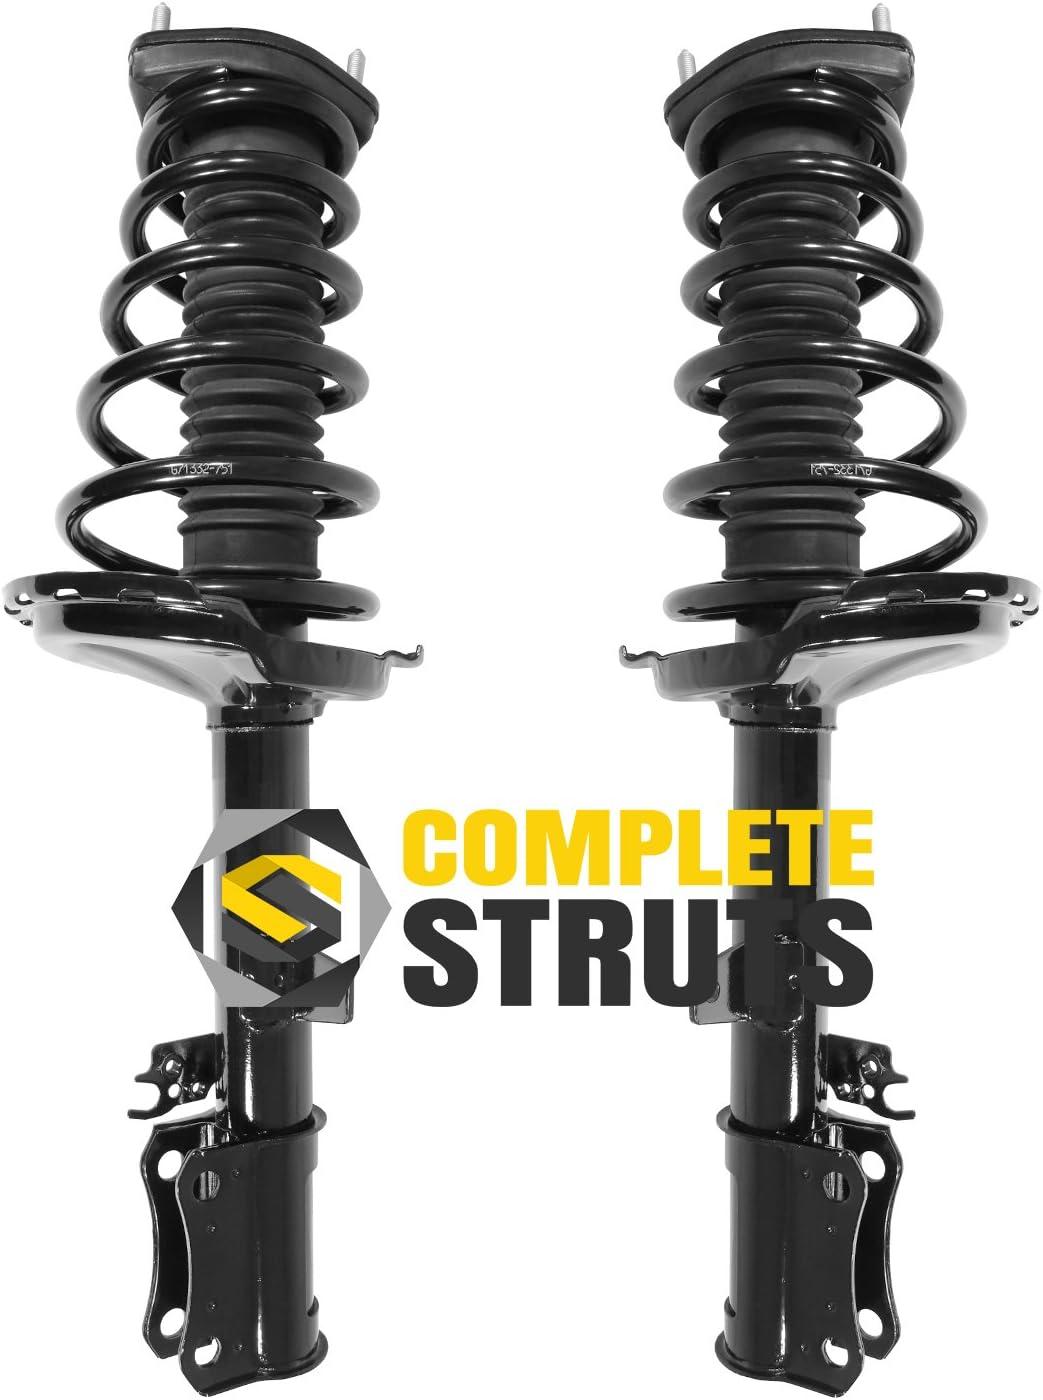 Pair Rear Quick Complete Struts /& Coil Spring Assemblies Compatible with 2004-2006 Lexus RX330 FWD